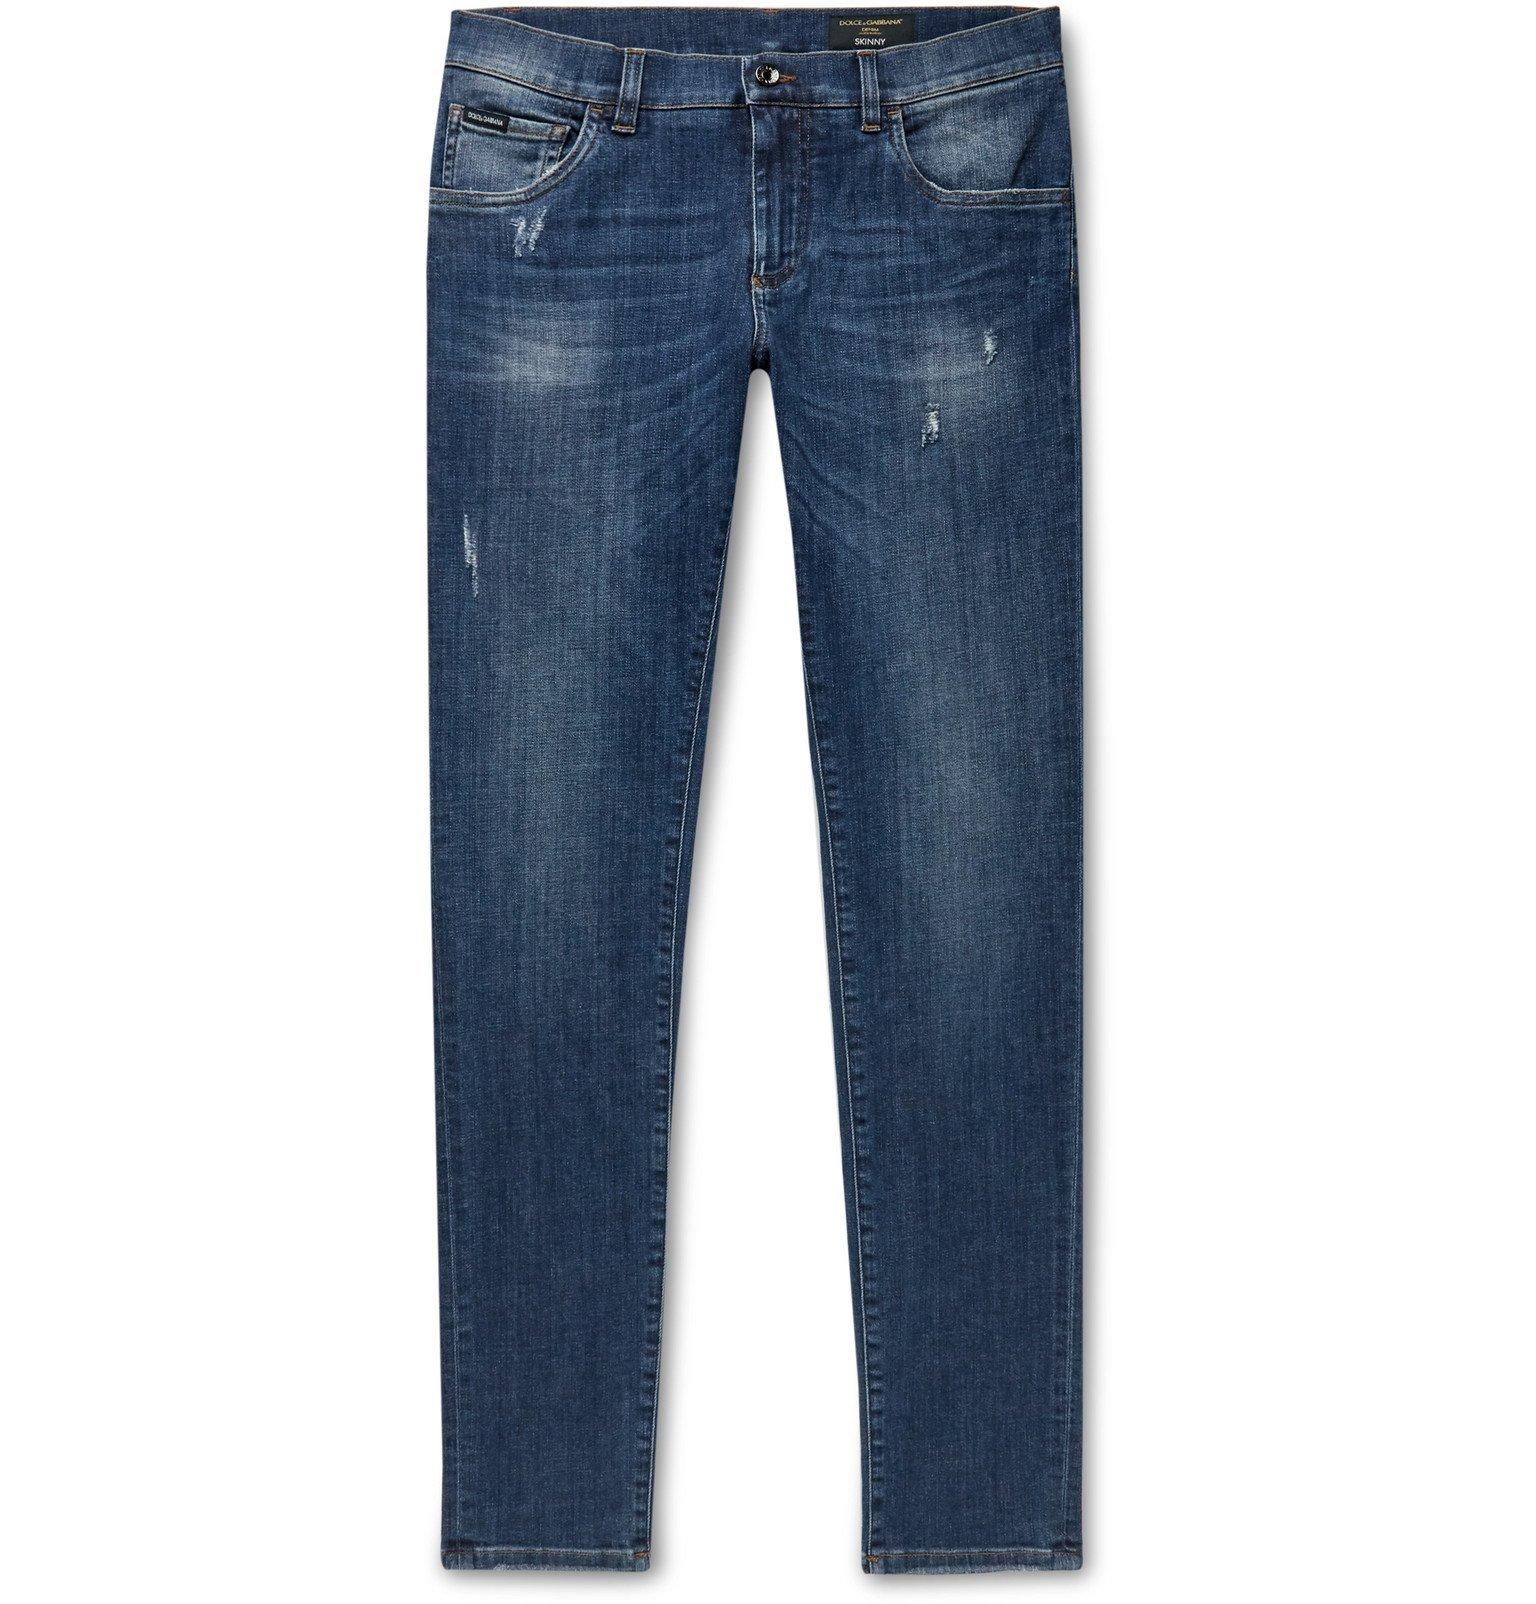 Dolce & Gabbana - Skinny-Fit Distressed Stretch-Denim Jeans - Blue